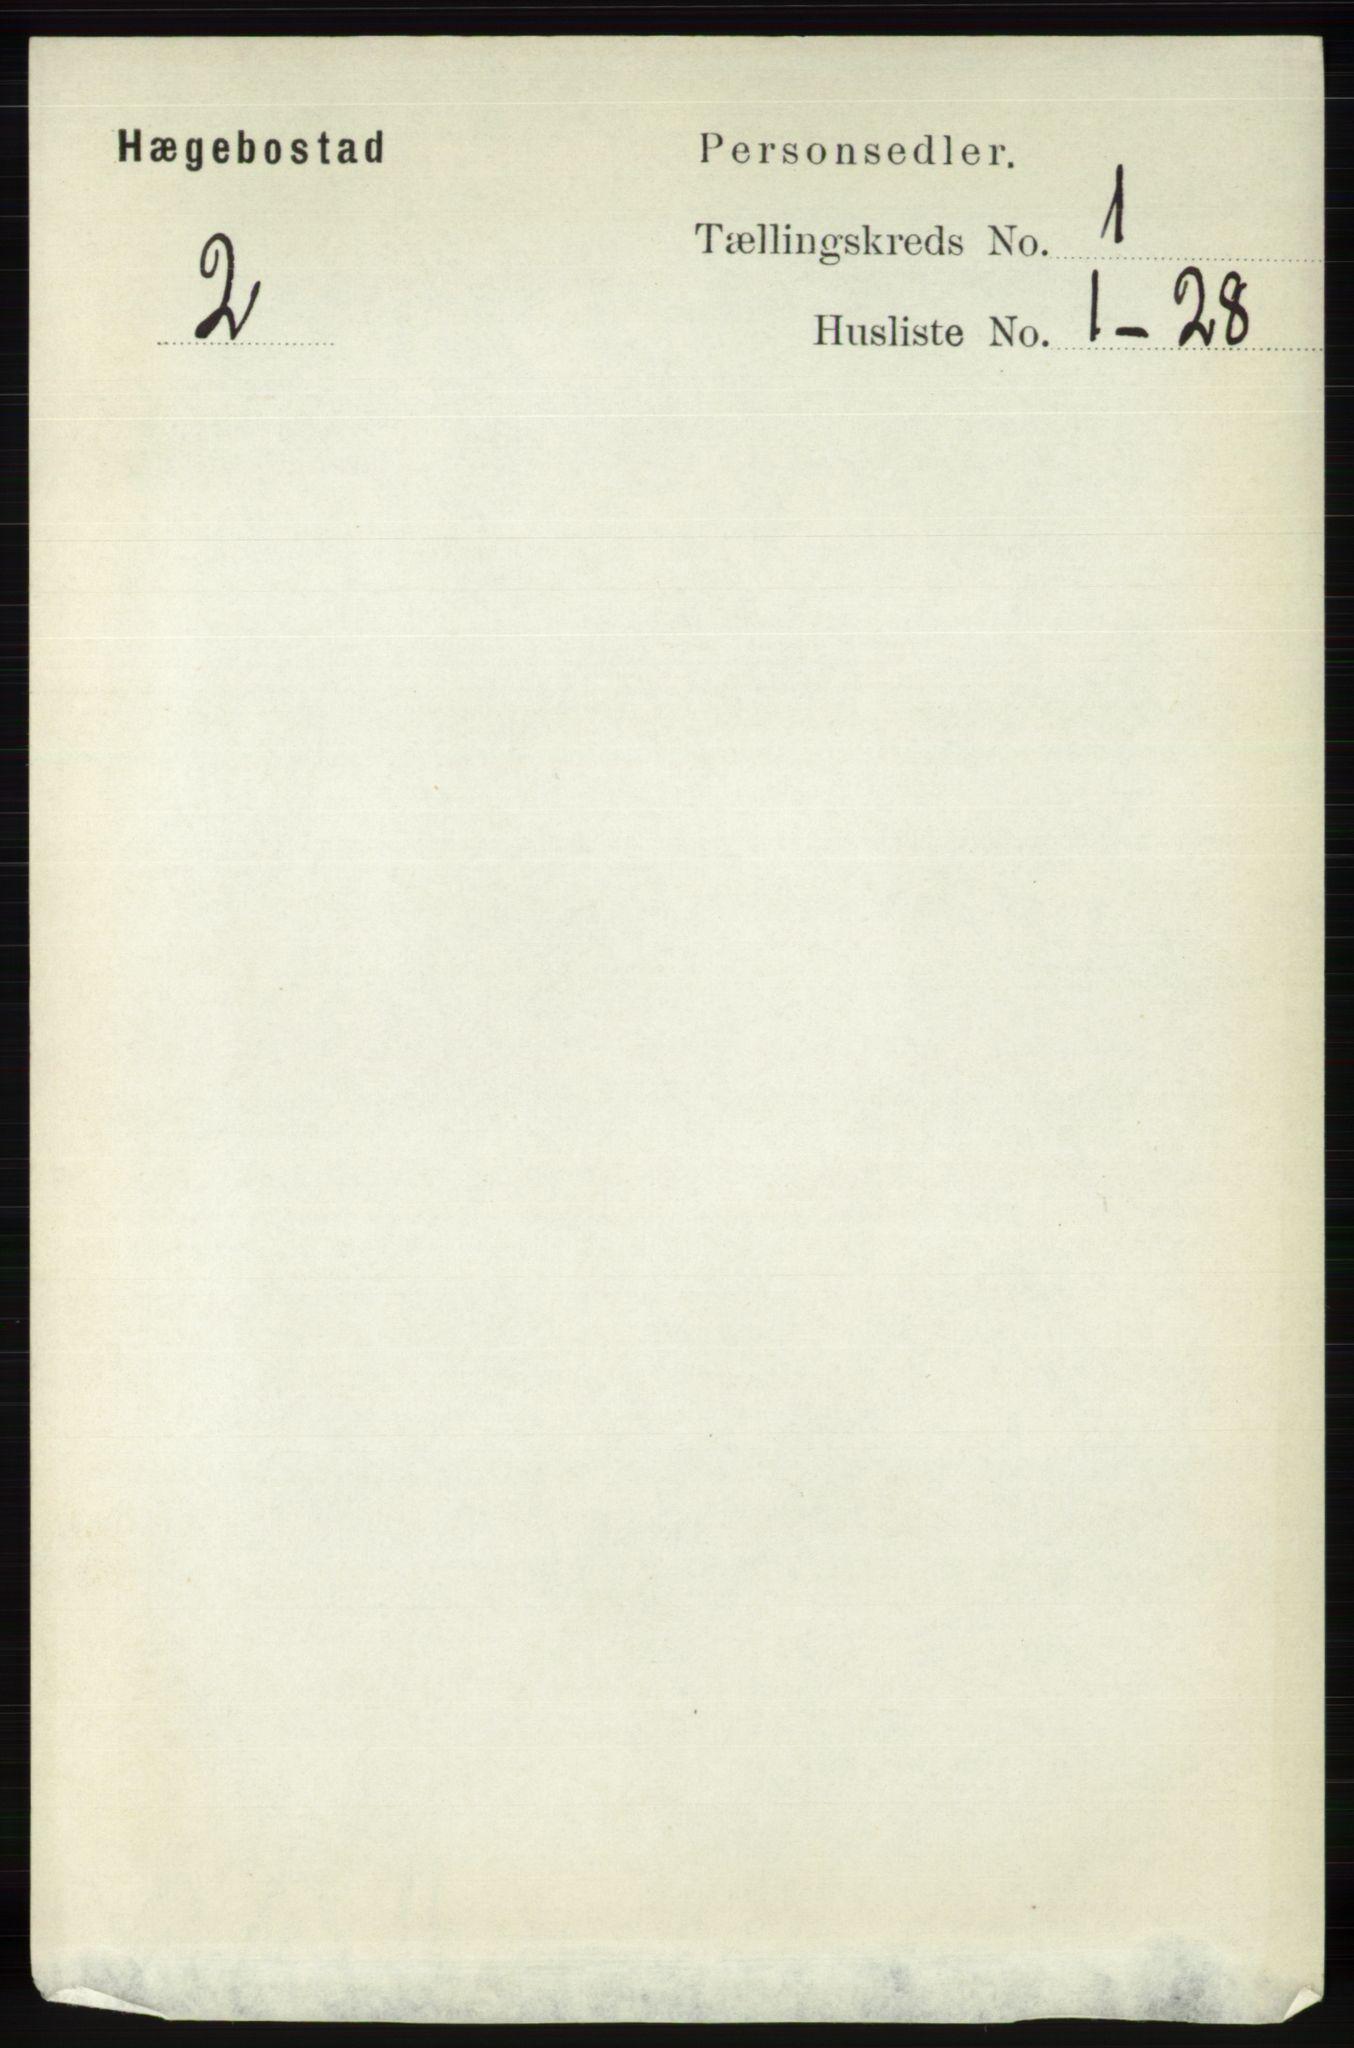 RA, Folketelling 1891 for 1034 Hægebostad herred, 1891, s. 88